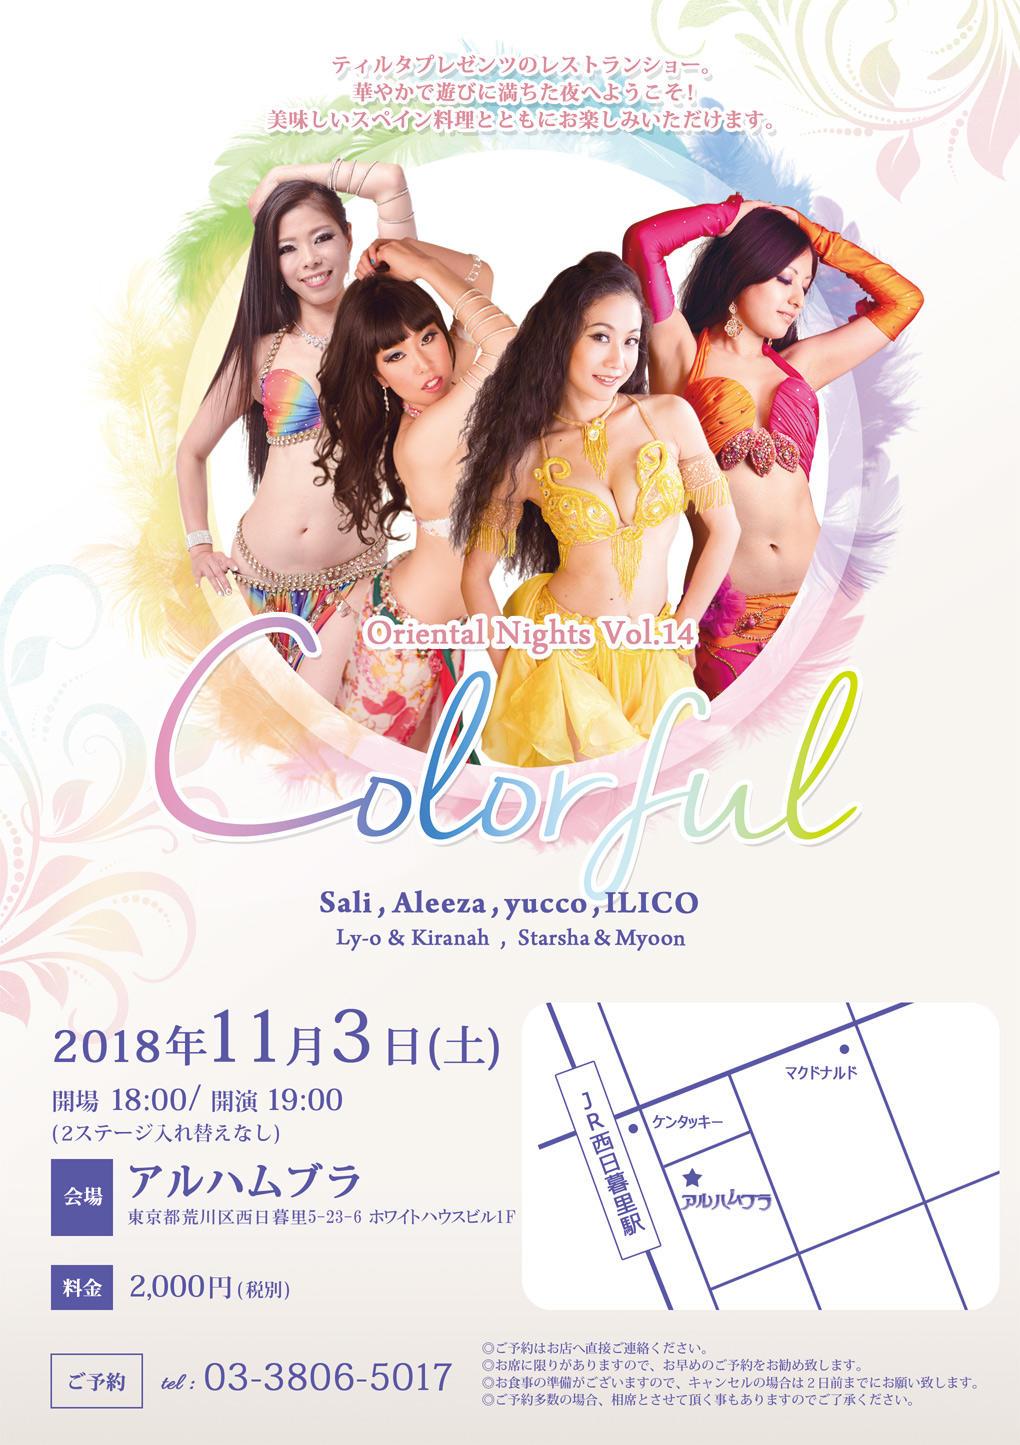 http://tilta.jp/a45f1a8b5645f69f663f93462ce61ab0f373fb5e.jpg